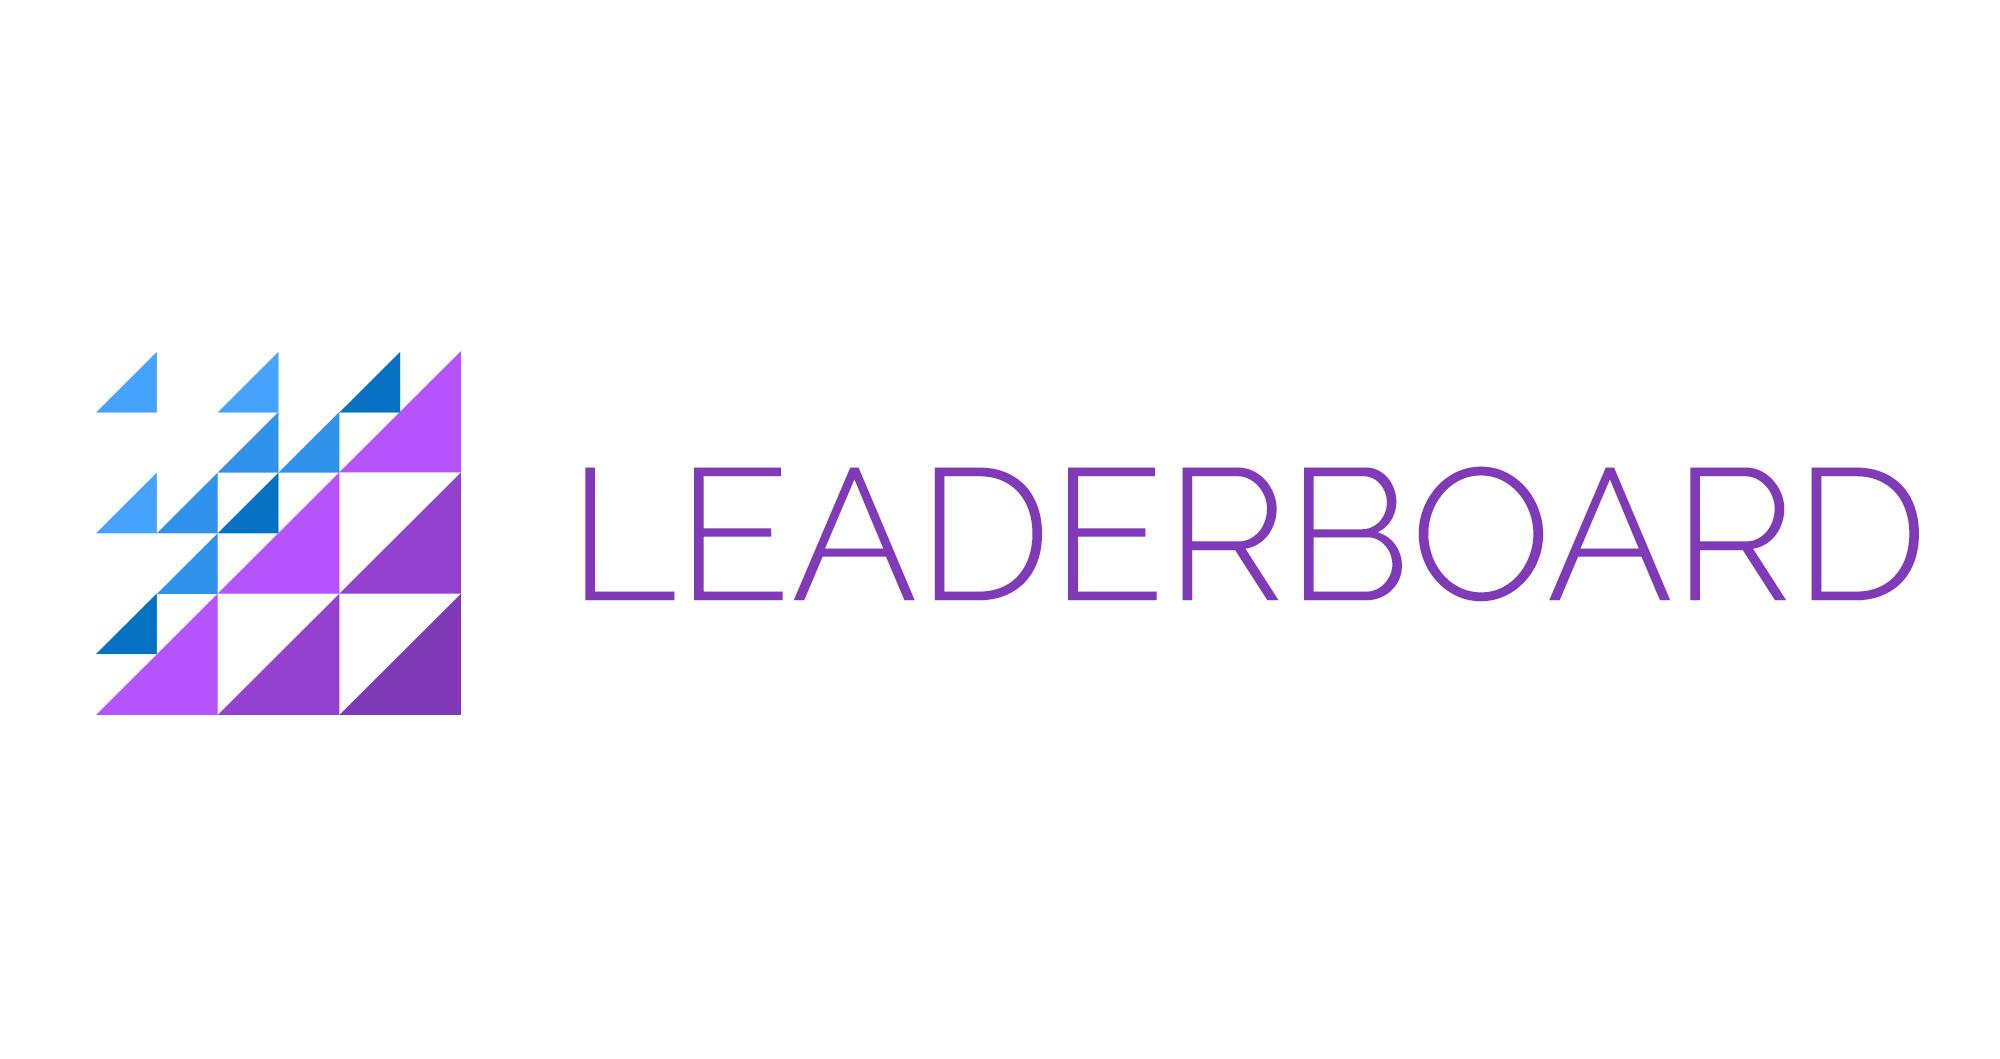 c1-sub-brands-leaderboard